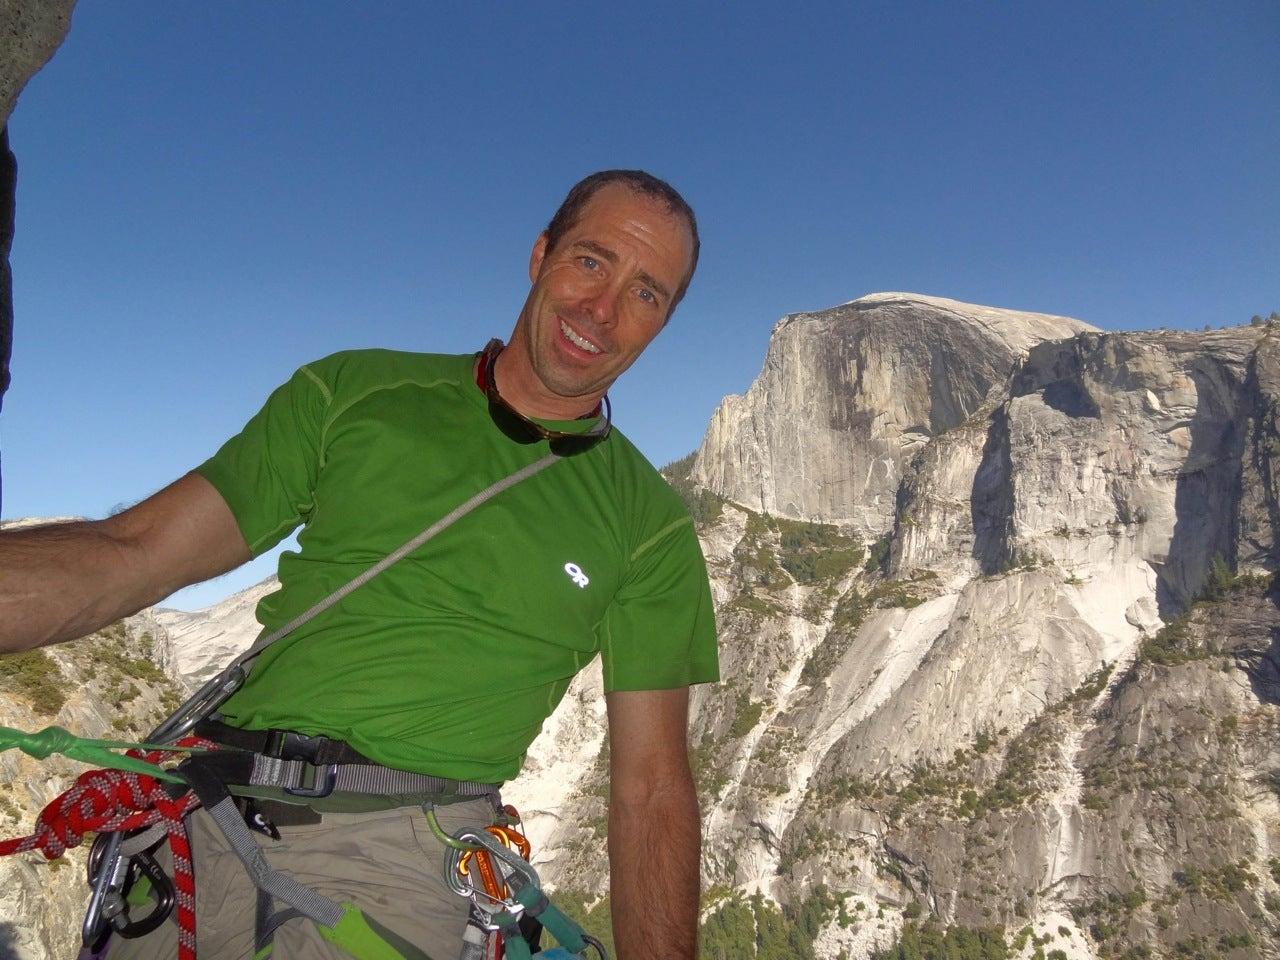 Five Questions With Climber Sam Lightner